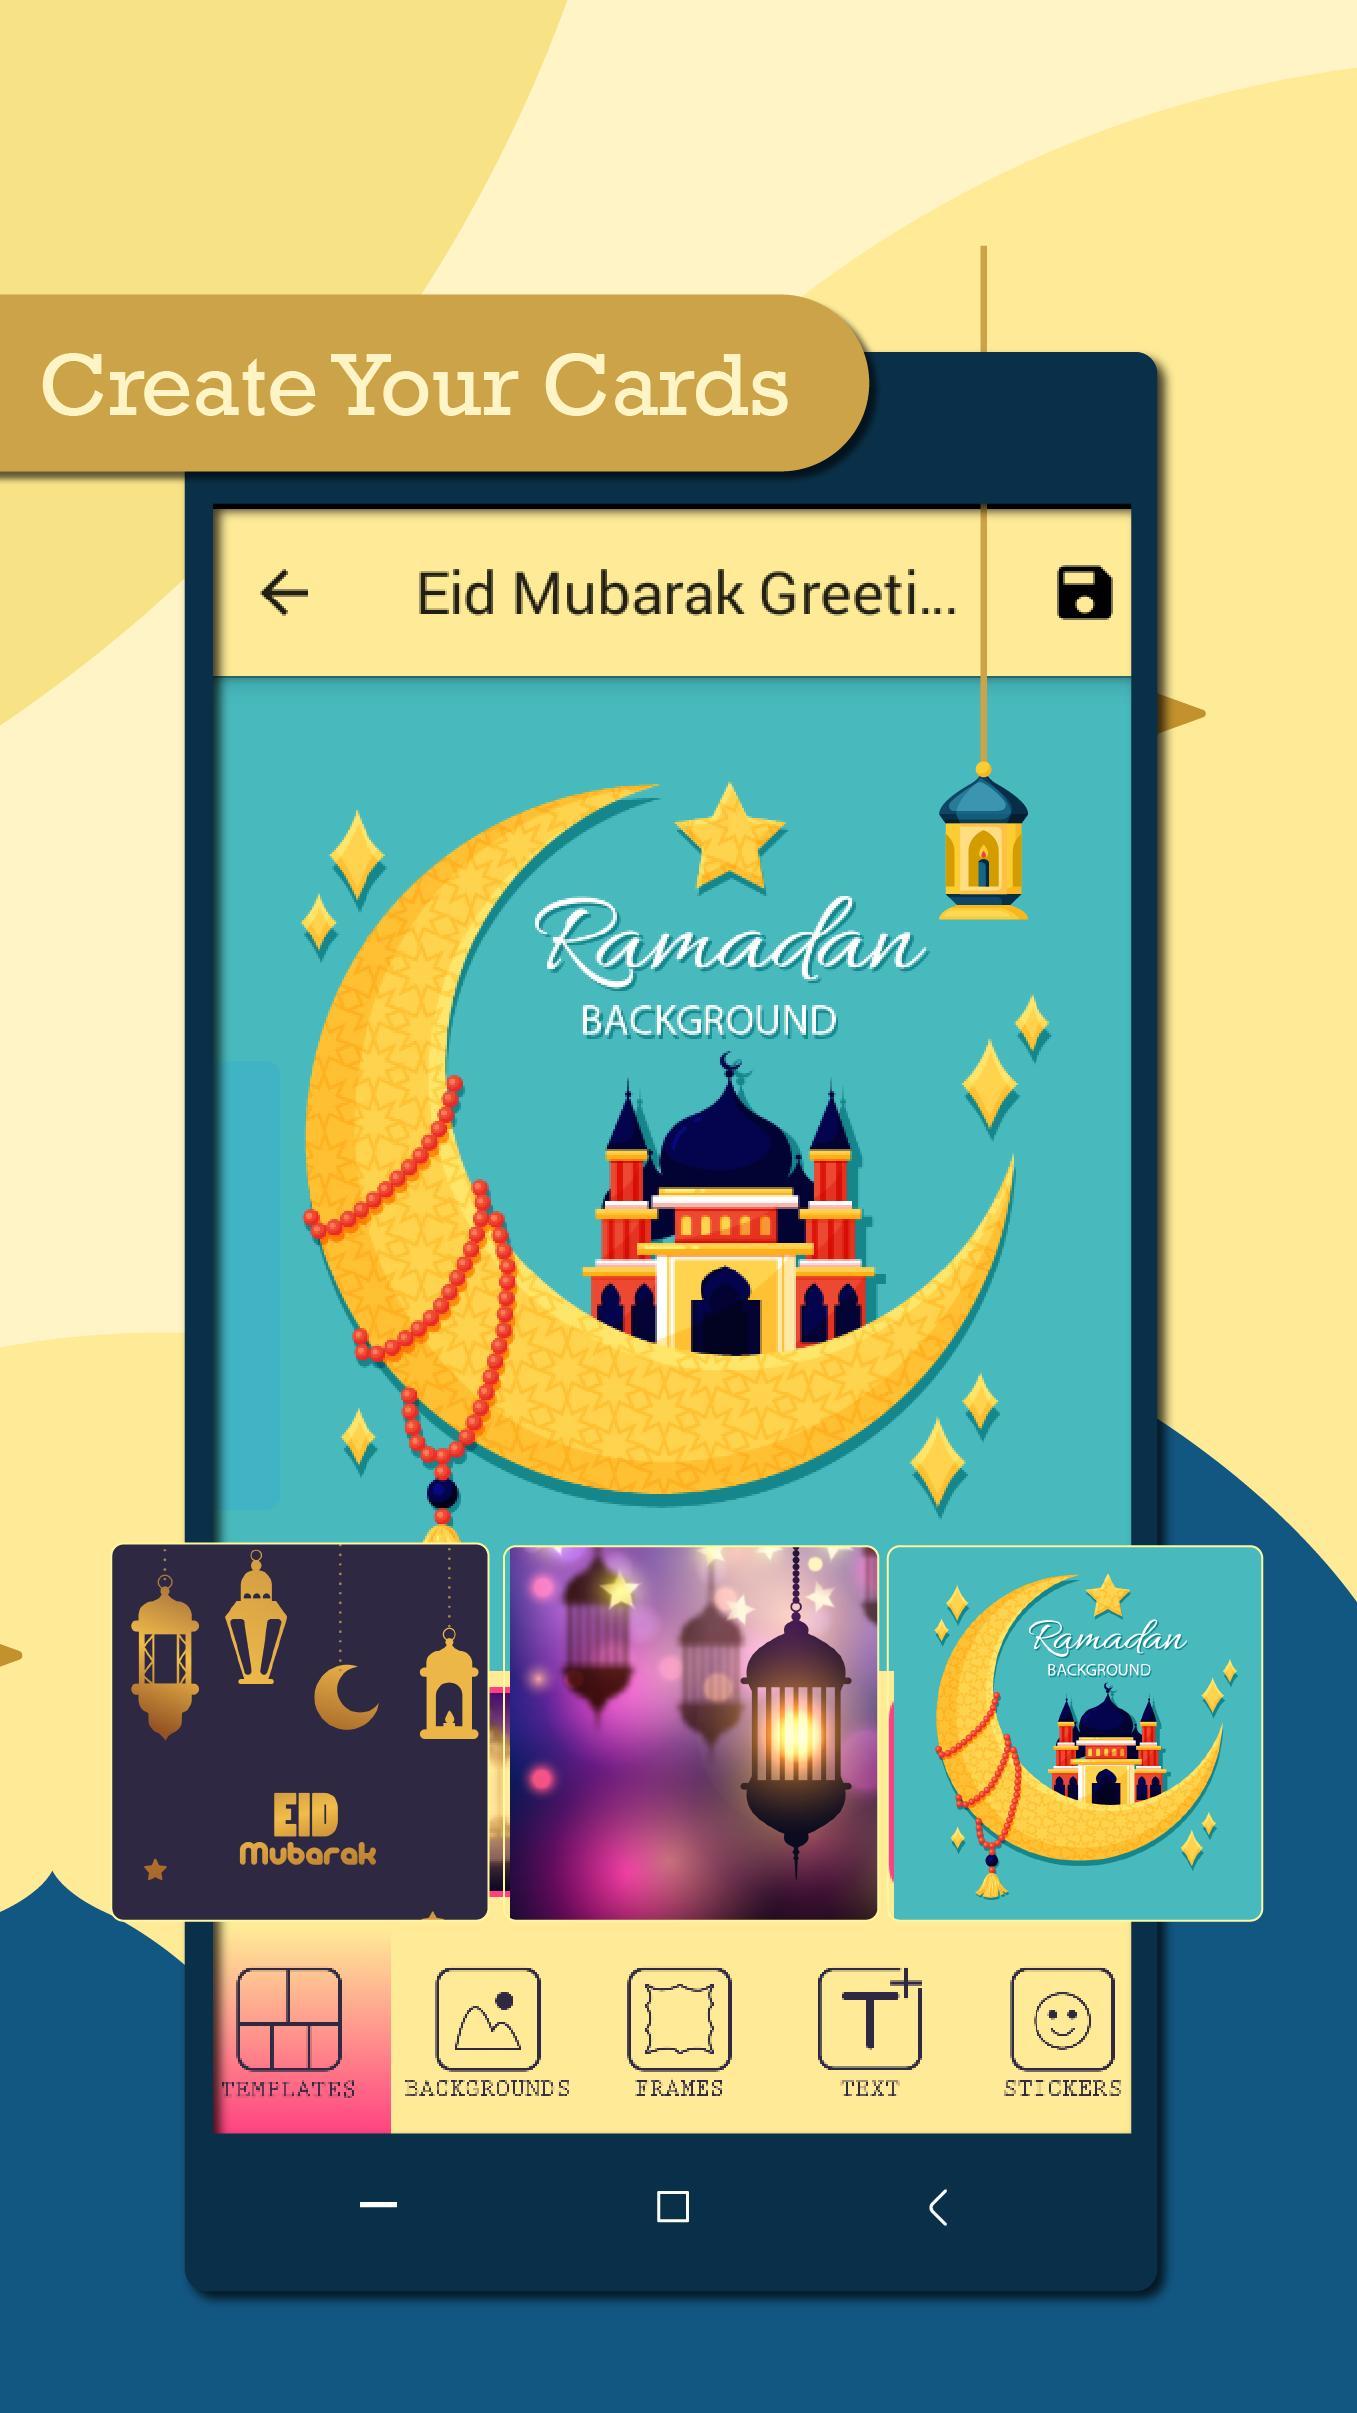 Eid Mubarak Greeting card Maker 5 for Android - APK Download